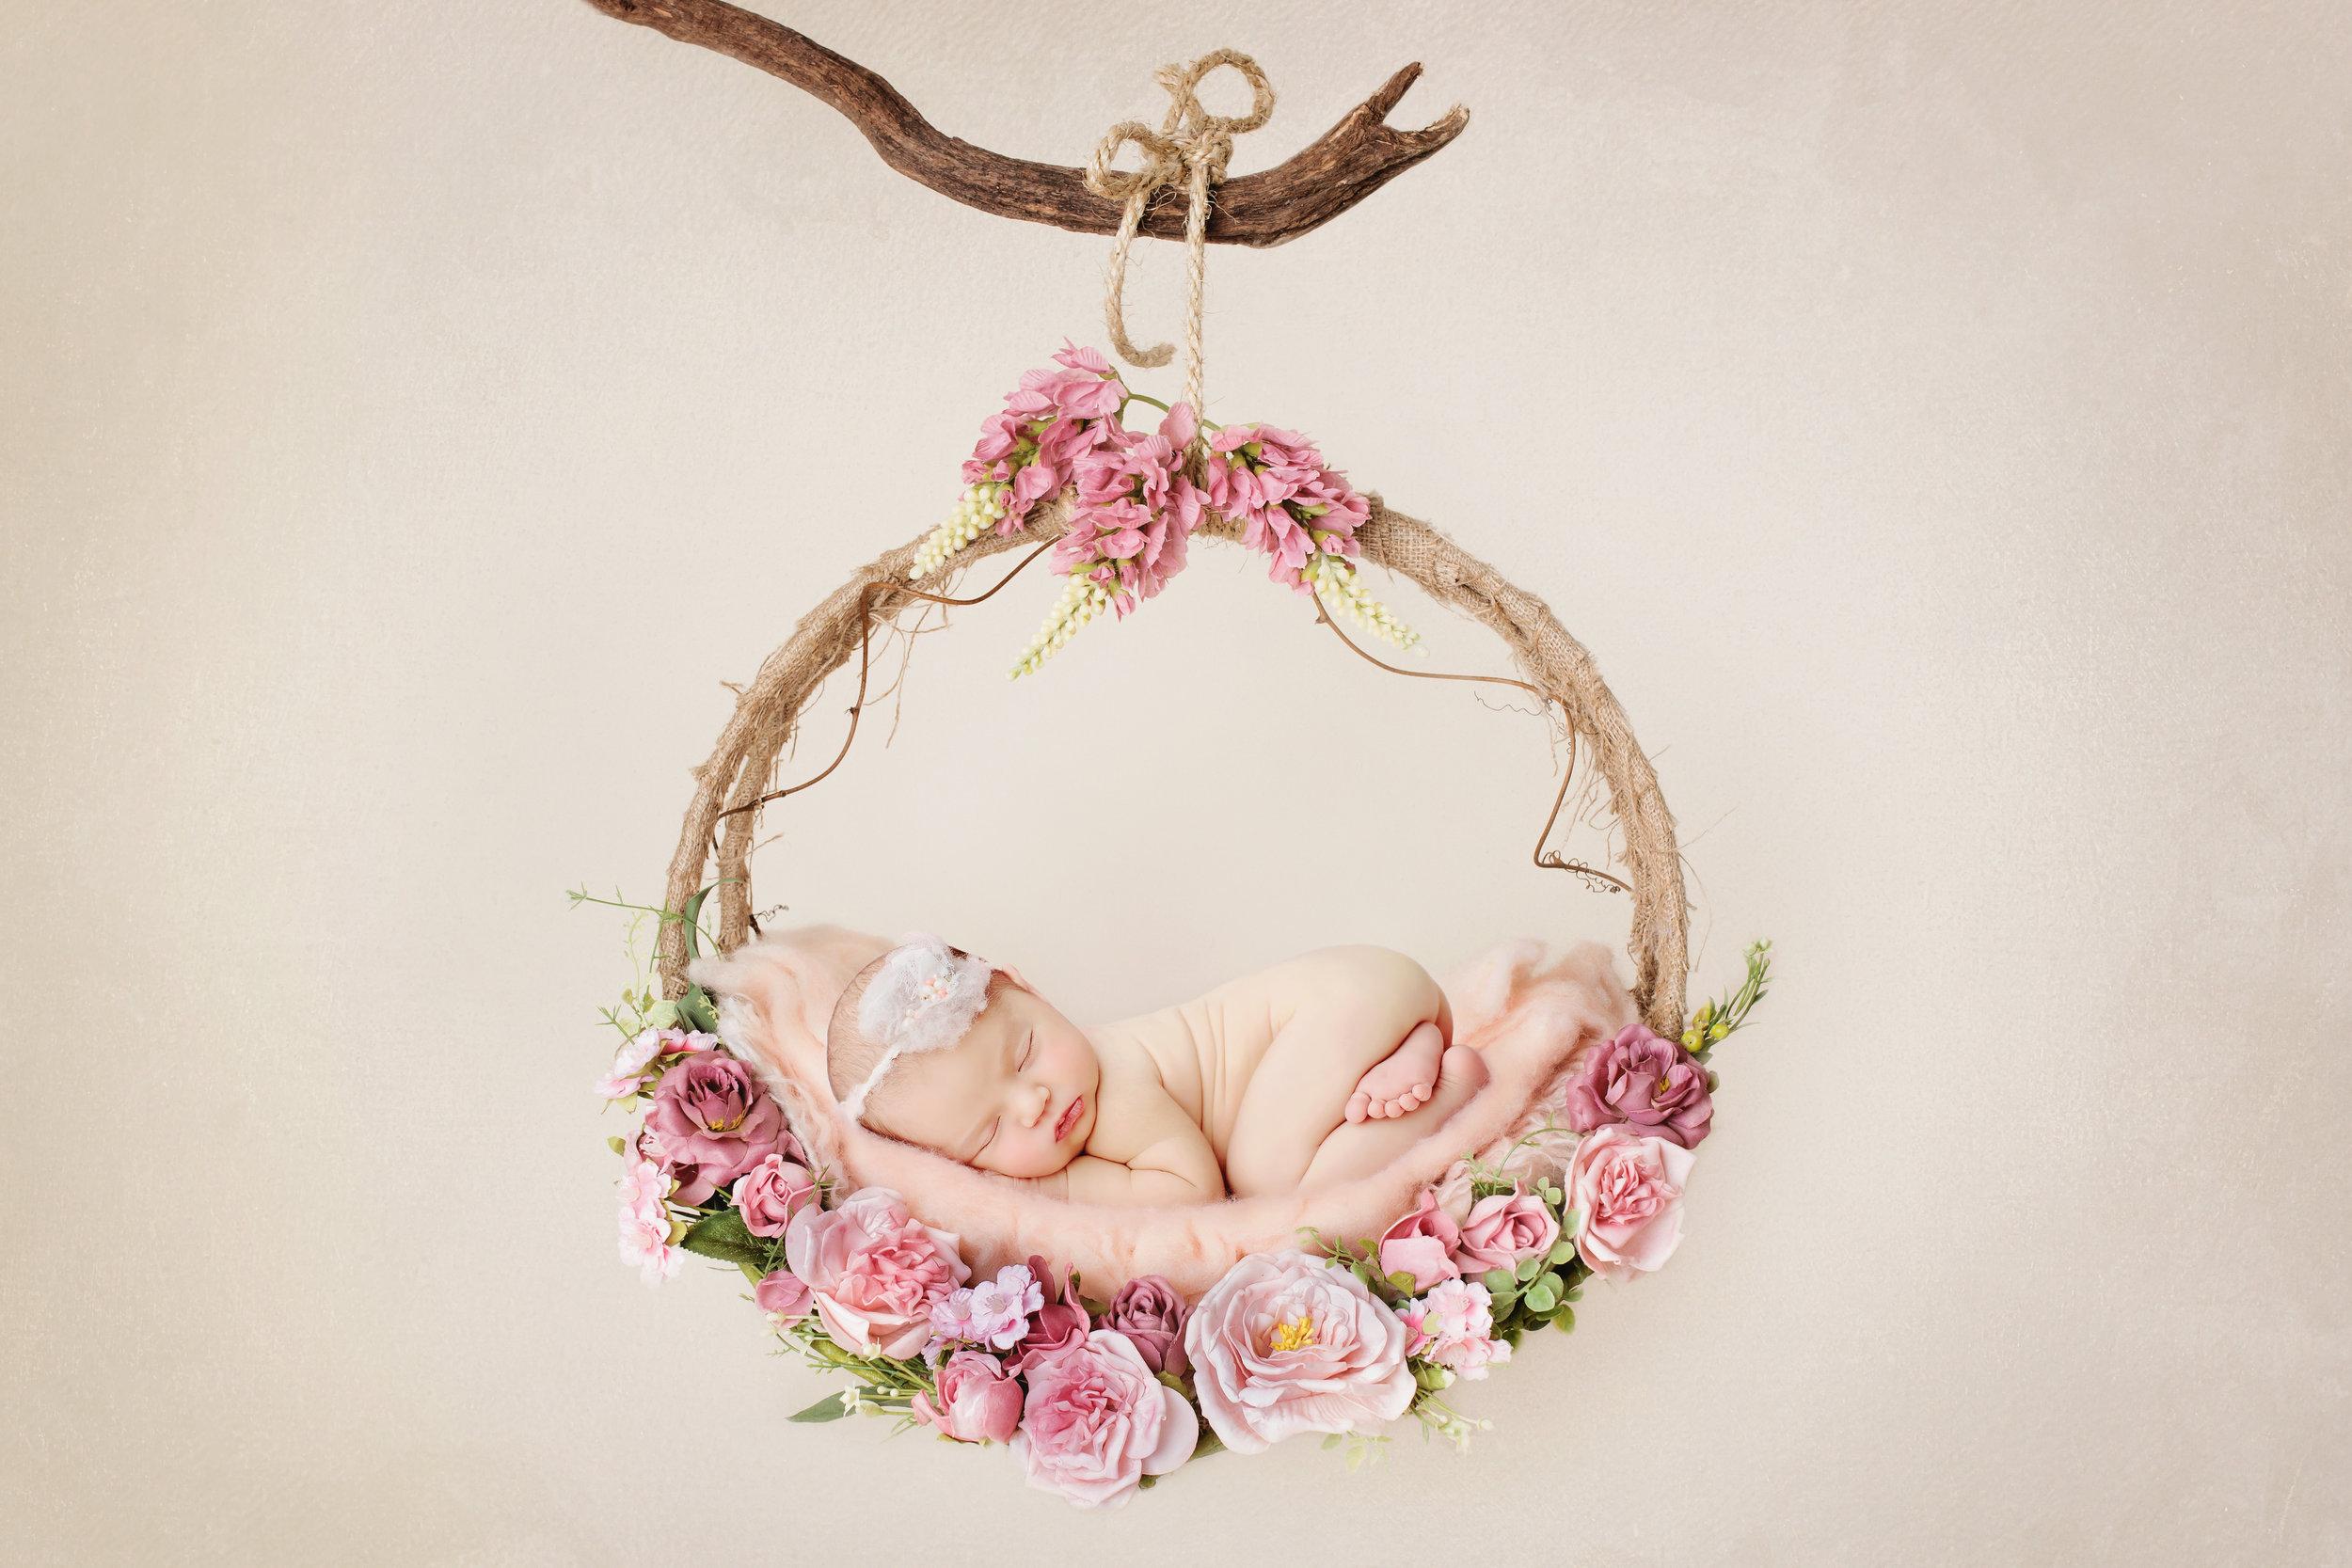 hammock-biancamorellophotography-joshuanne-1.jpg